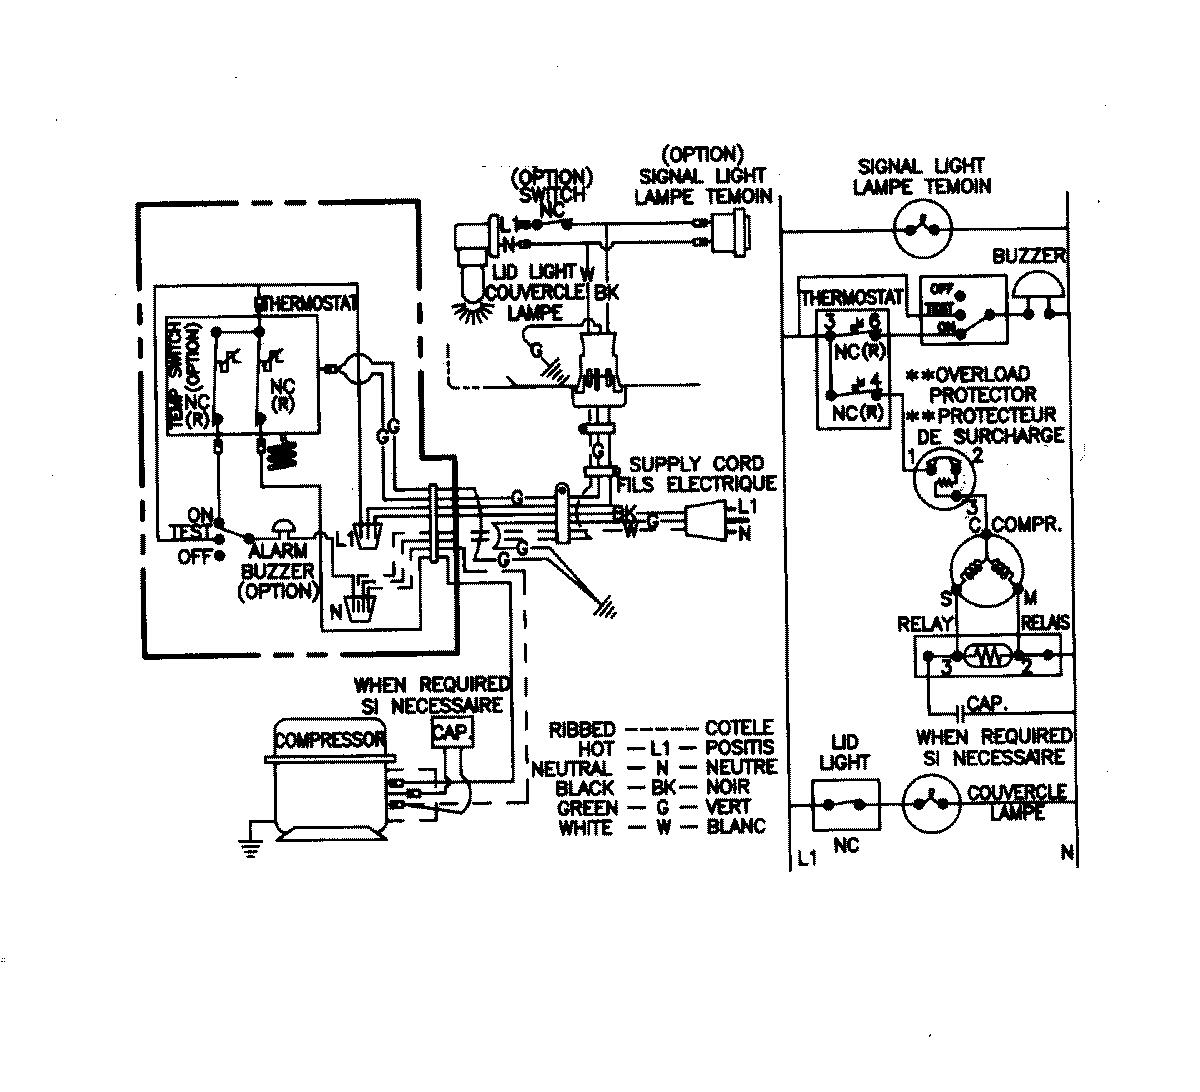 Haier Appliance Wiring Diagram